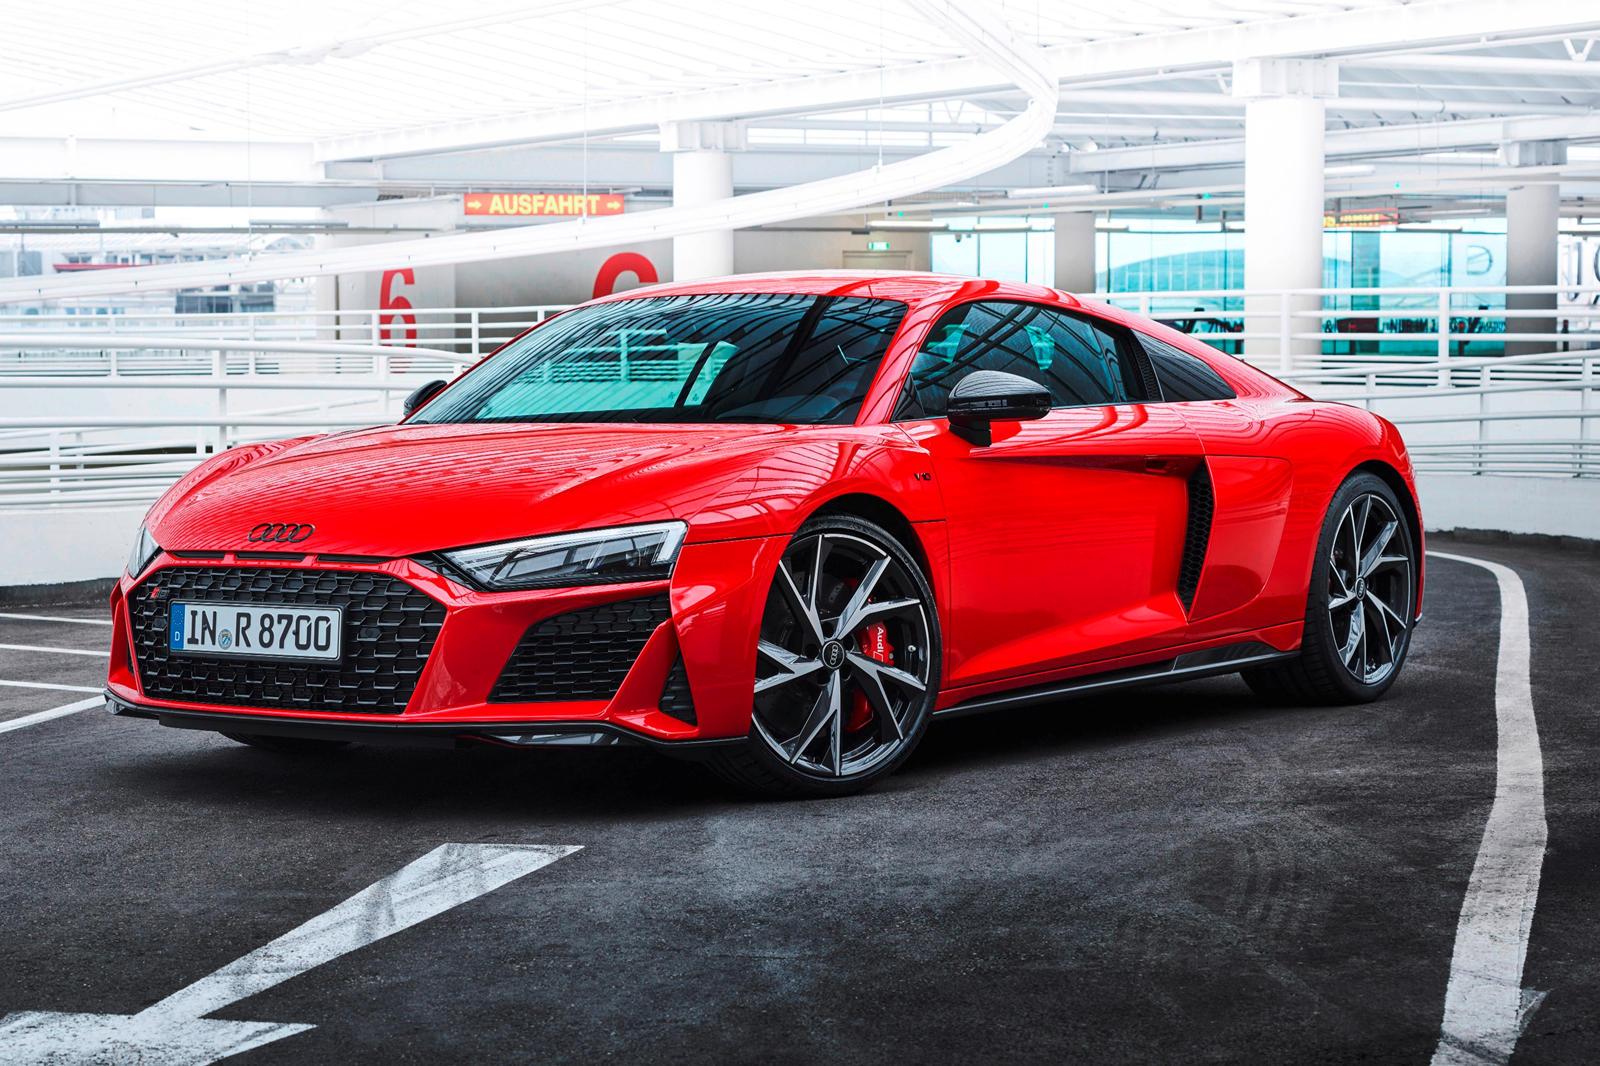 Audi R8 V10 RWD (8).jpg